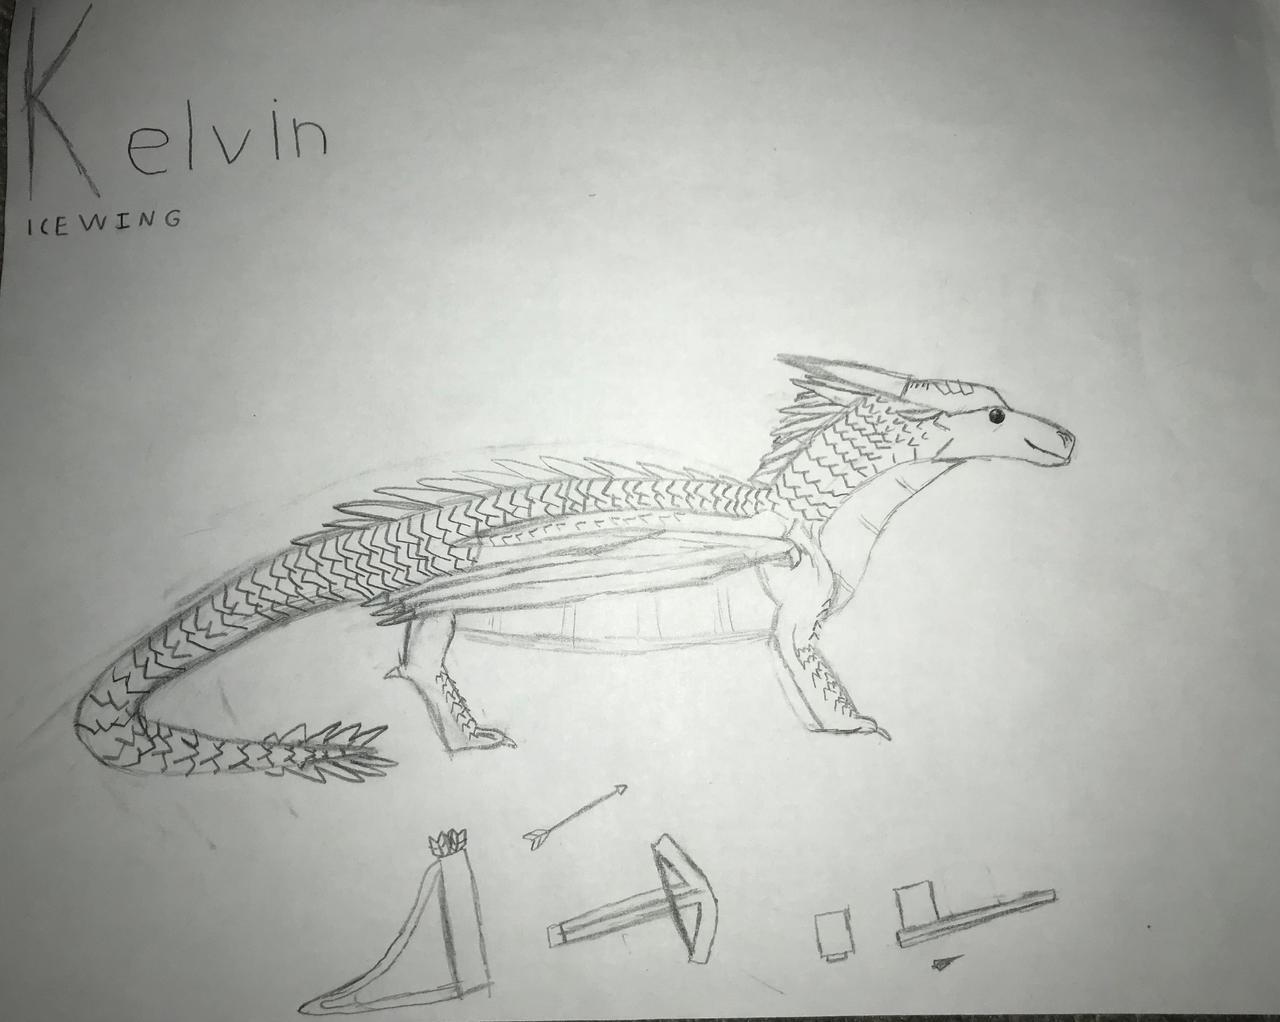 kelvin_the_icewing_by_lanturn171_deqo6vu